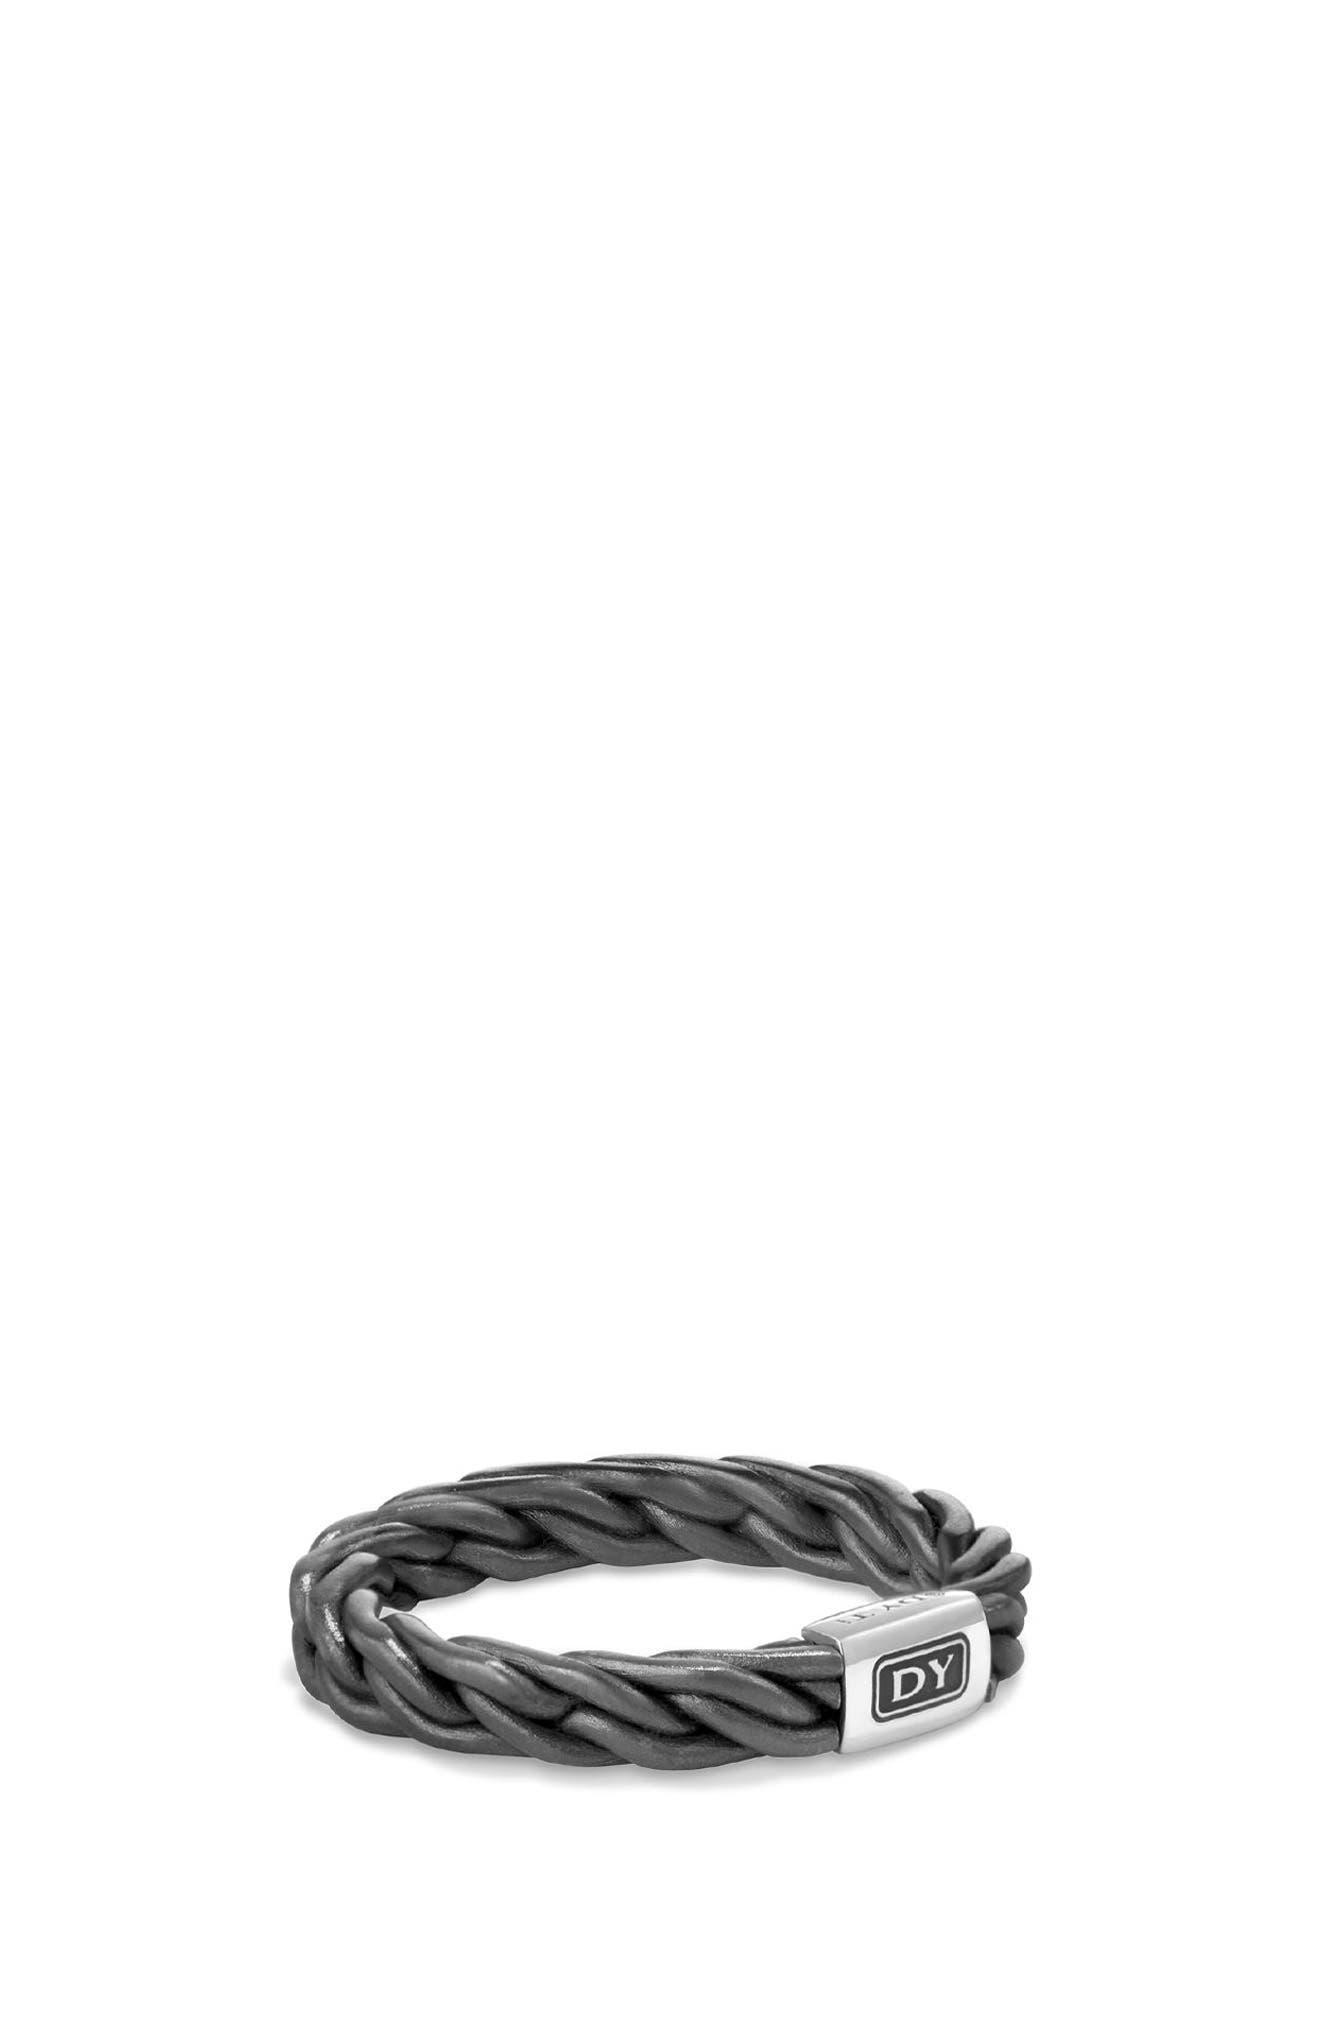 Titanium Band Ring,                             Main thumbnail 1, color,                             Gunmetal/ Titanium